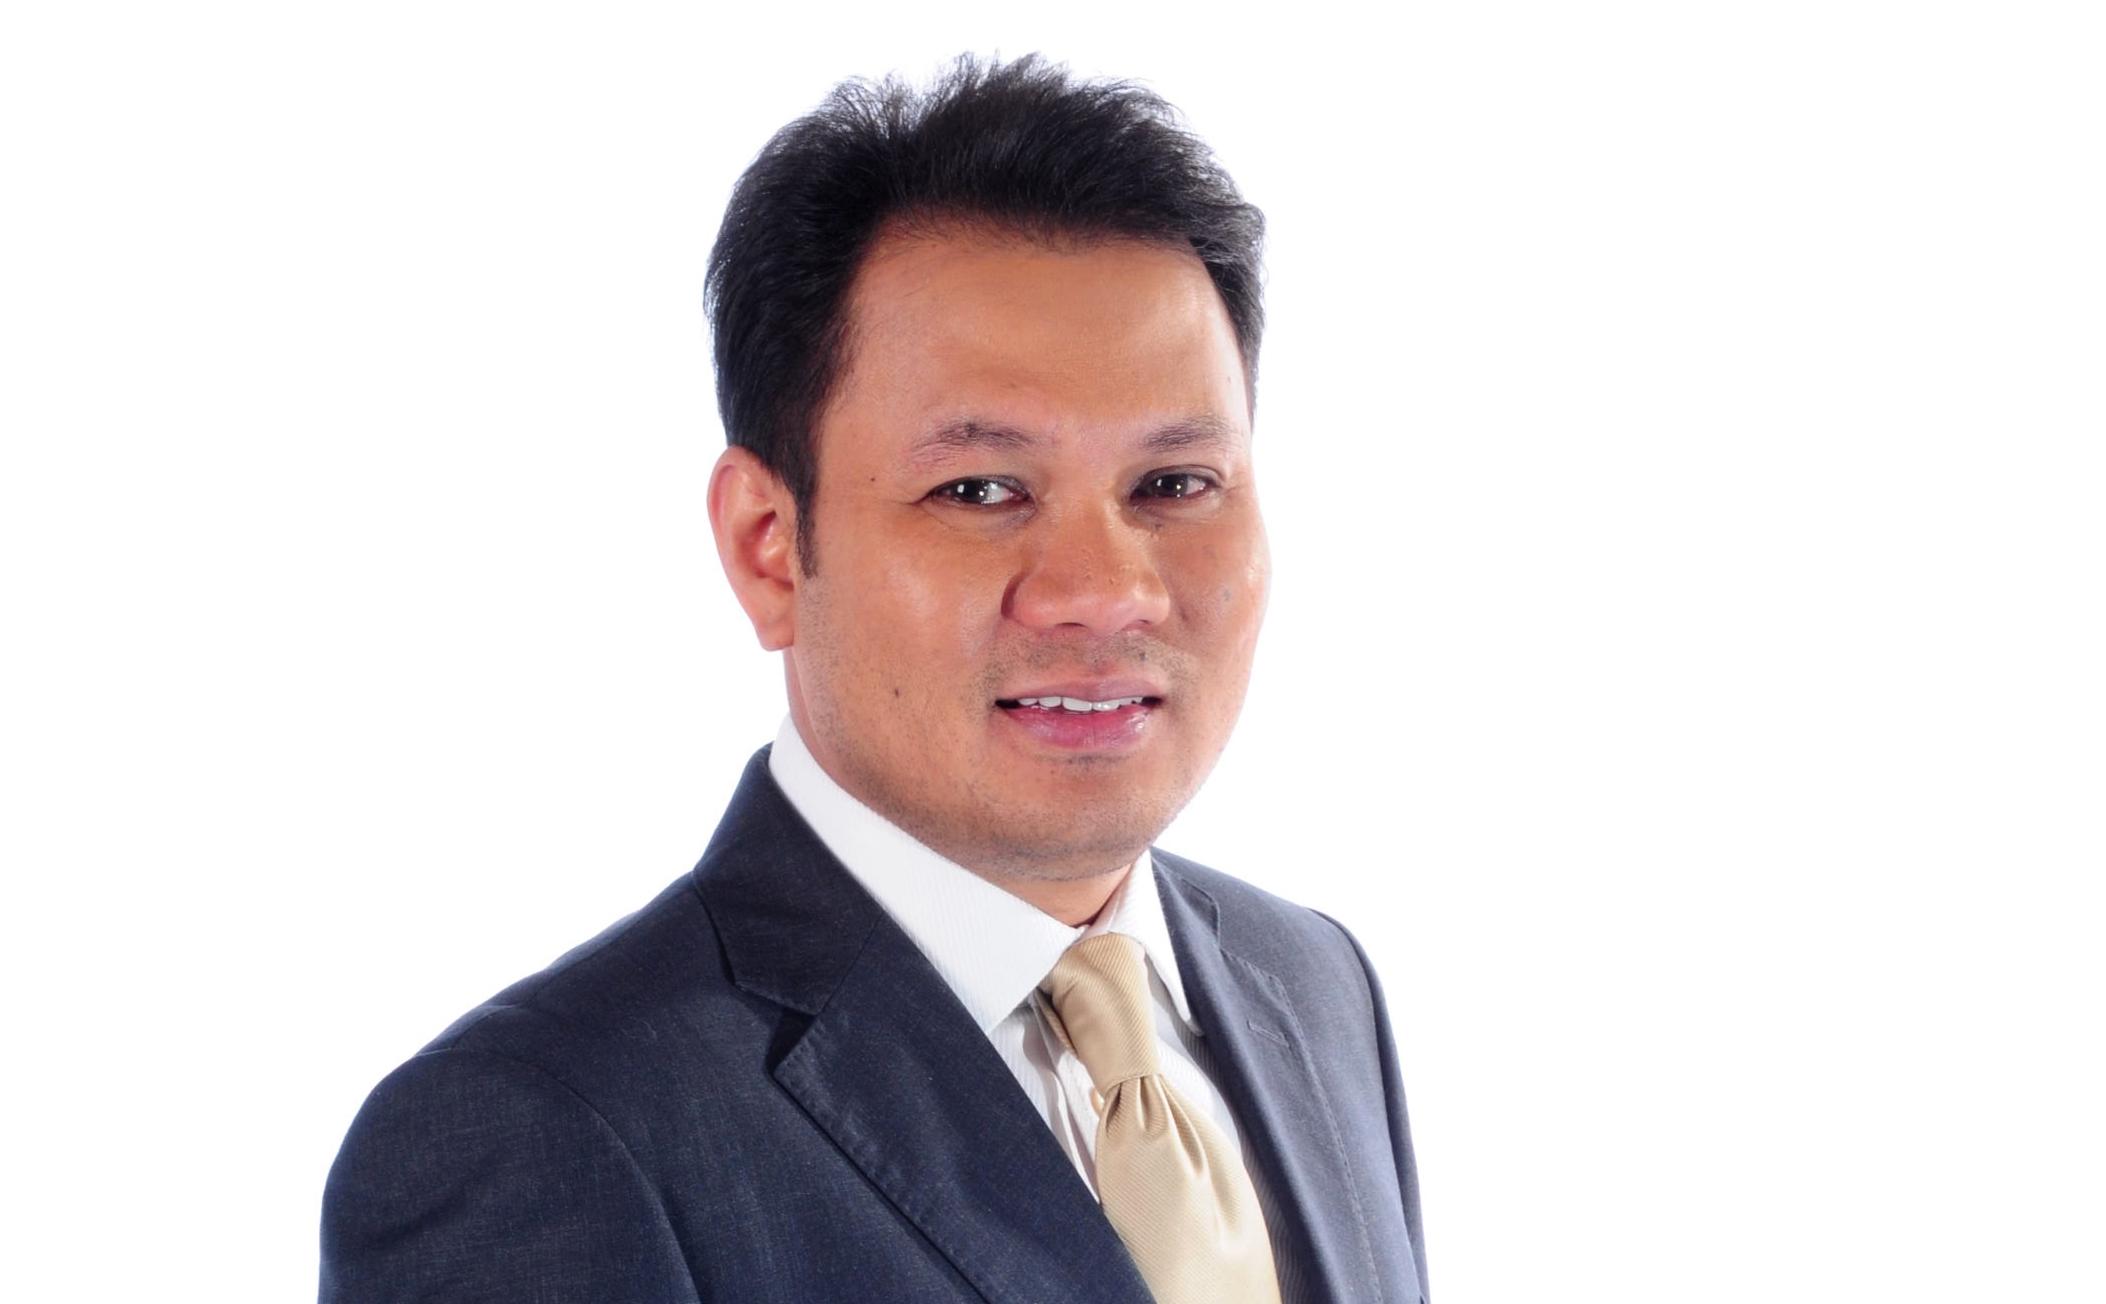 DRB-Hicom group managing director Datuk Seri Syed Faisal Albar